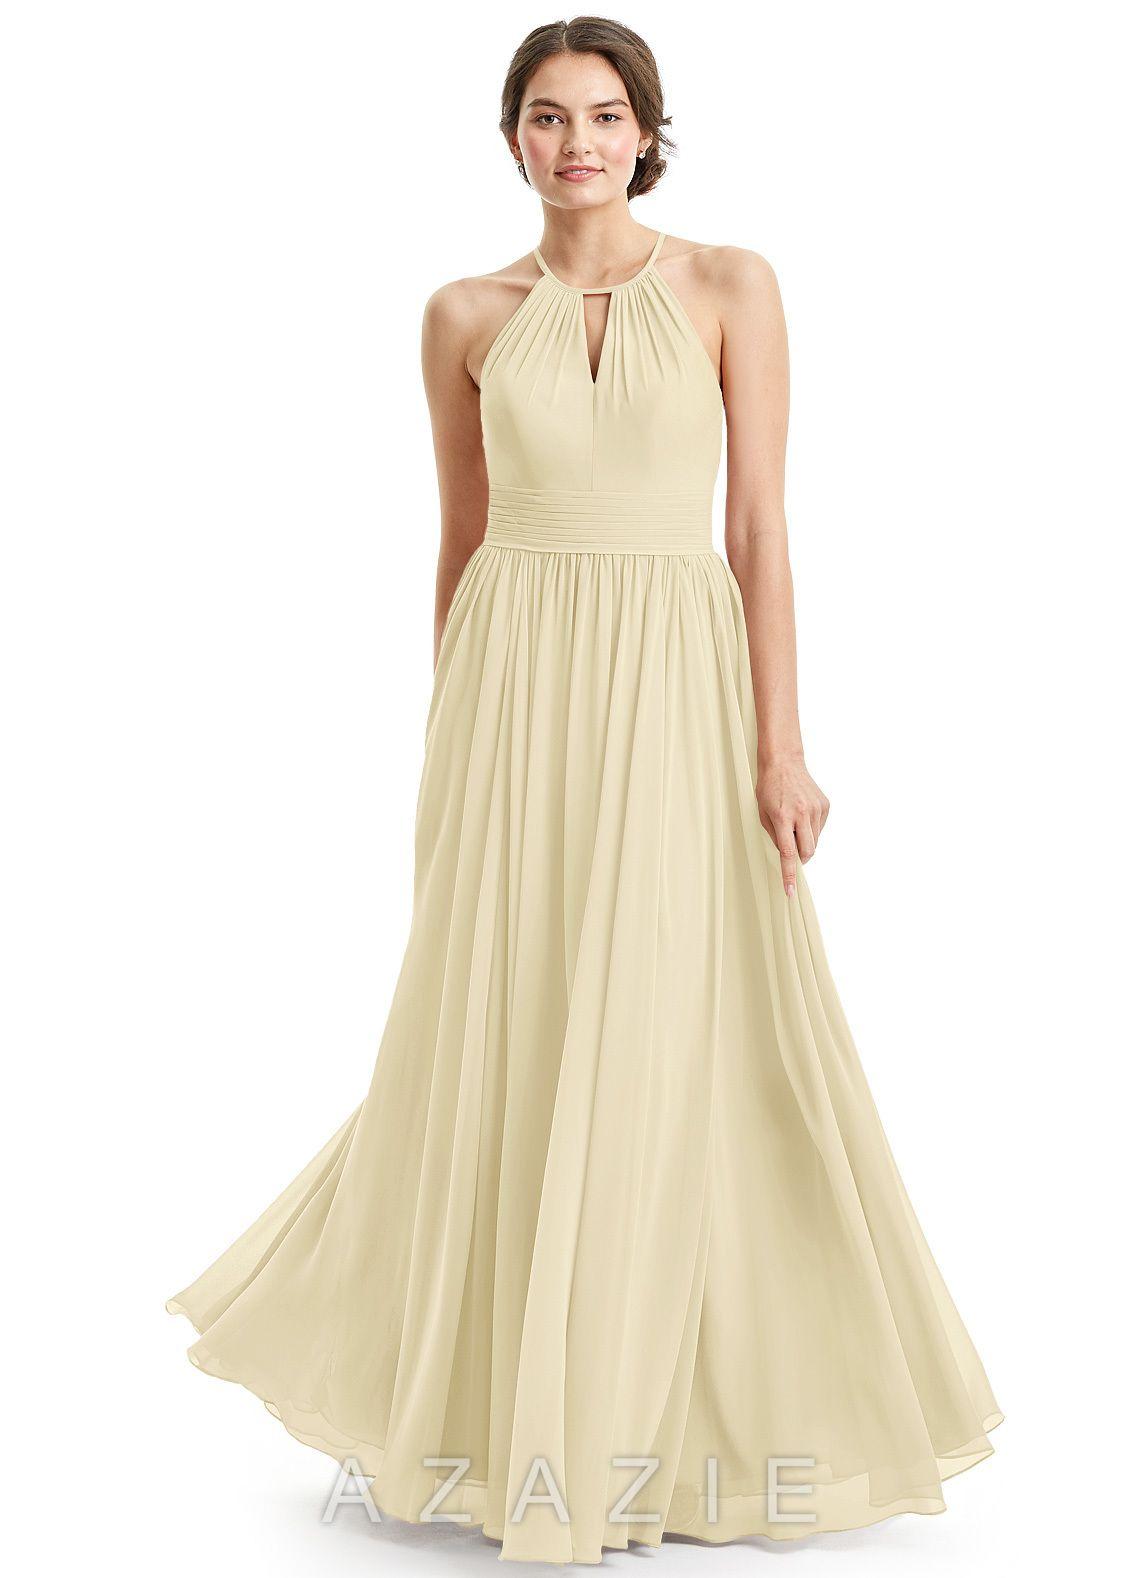 7c223da635b Azazie Cherish Bridesmaid Dress